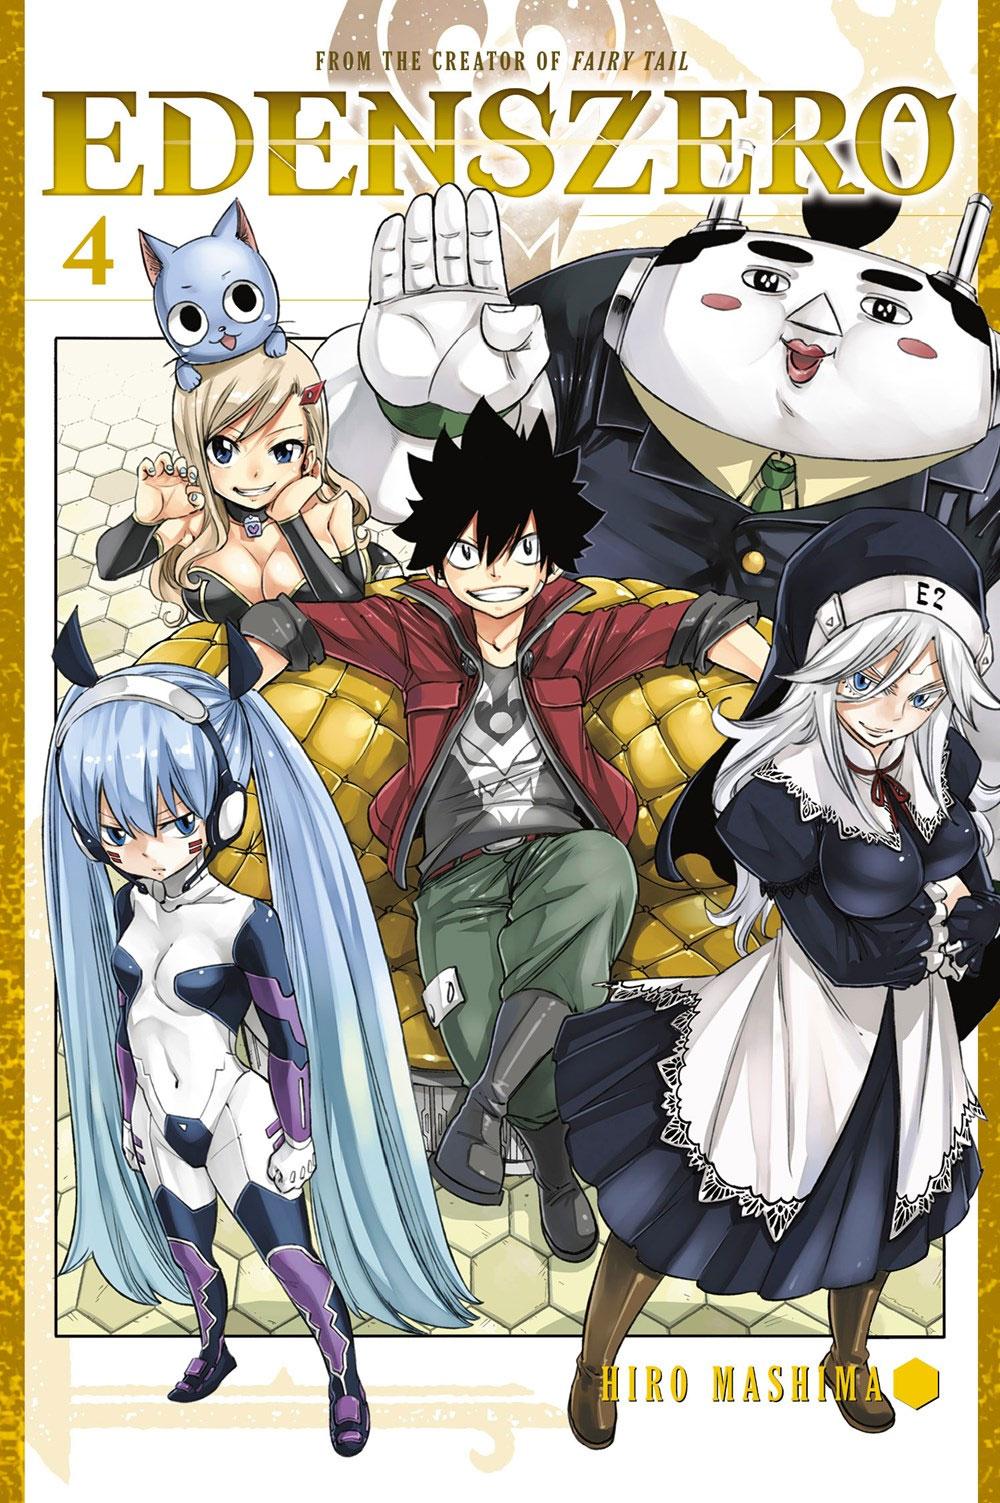 Koop TPB-Manga - Edens Zero vol 04 GN Manga - Archonia.com